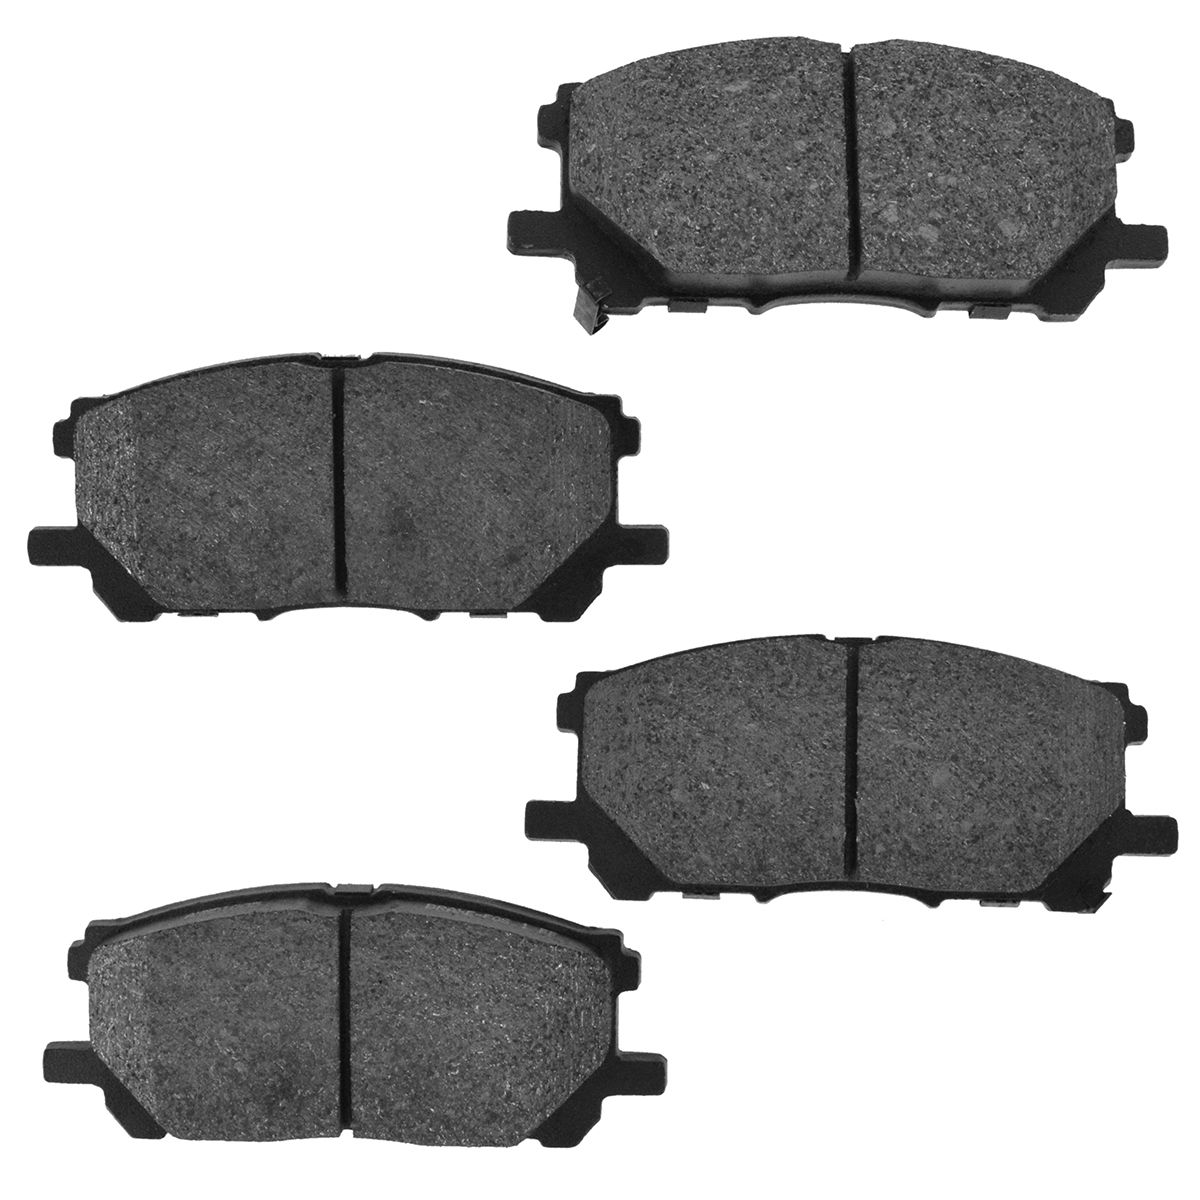 For Lexus,Toyota RX330,RX350,RX400h,Highlander Front Rear Semi-Met Brake Pads